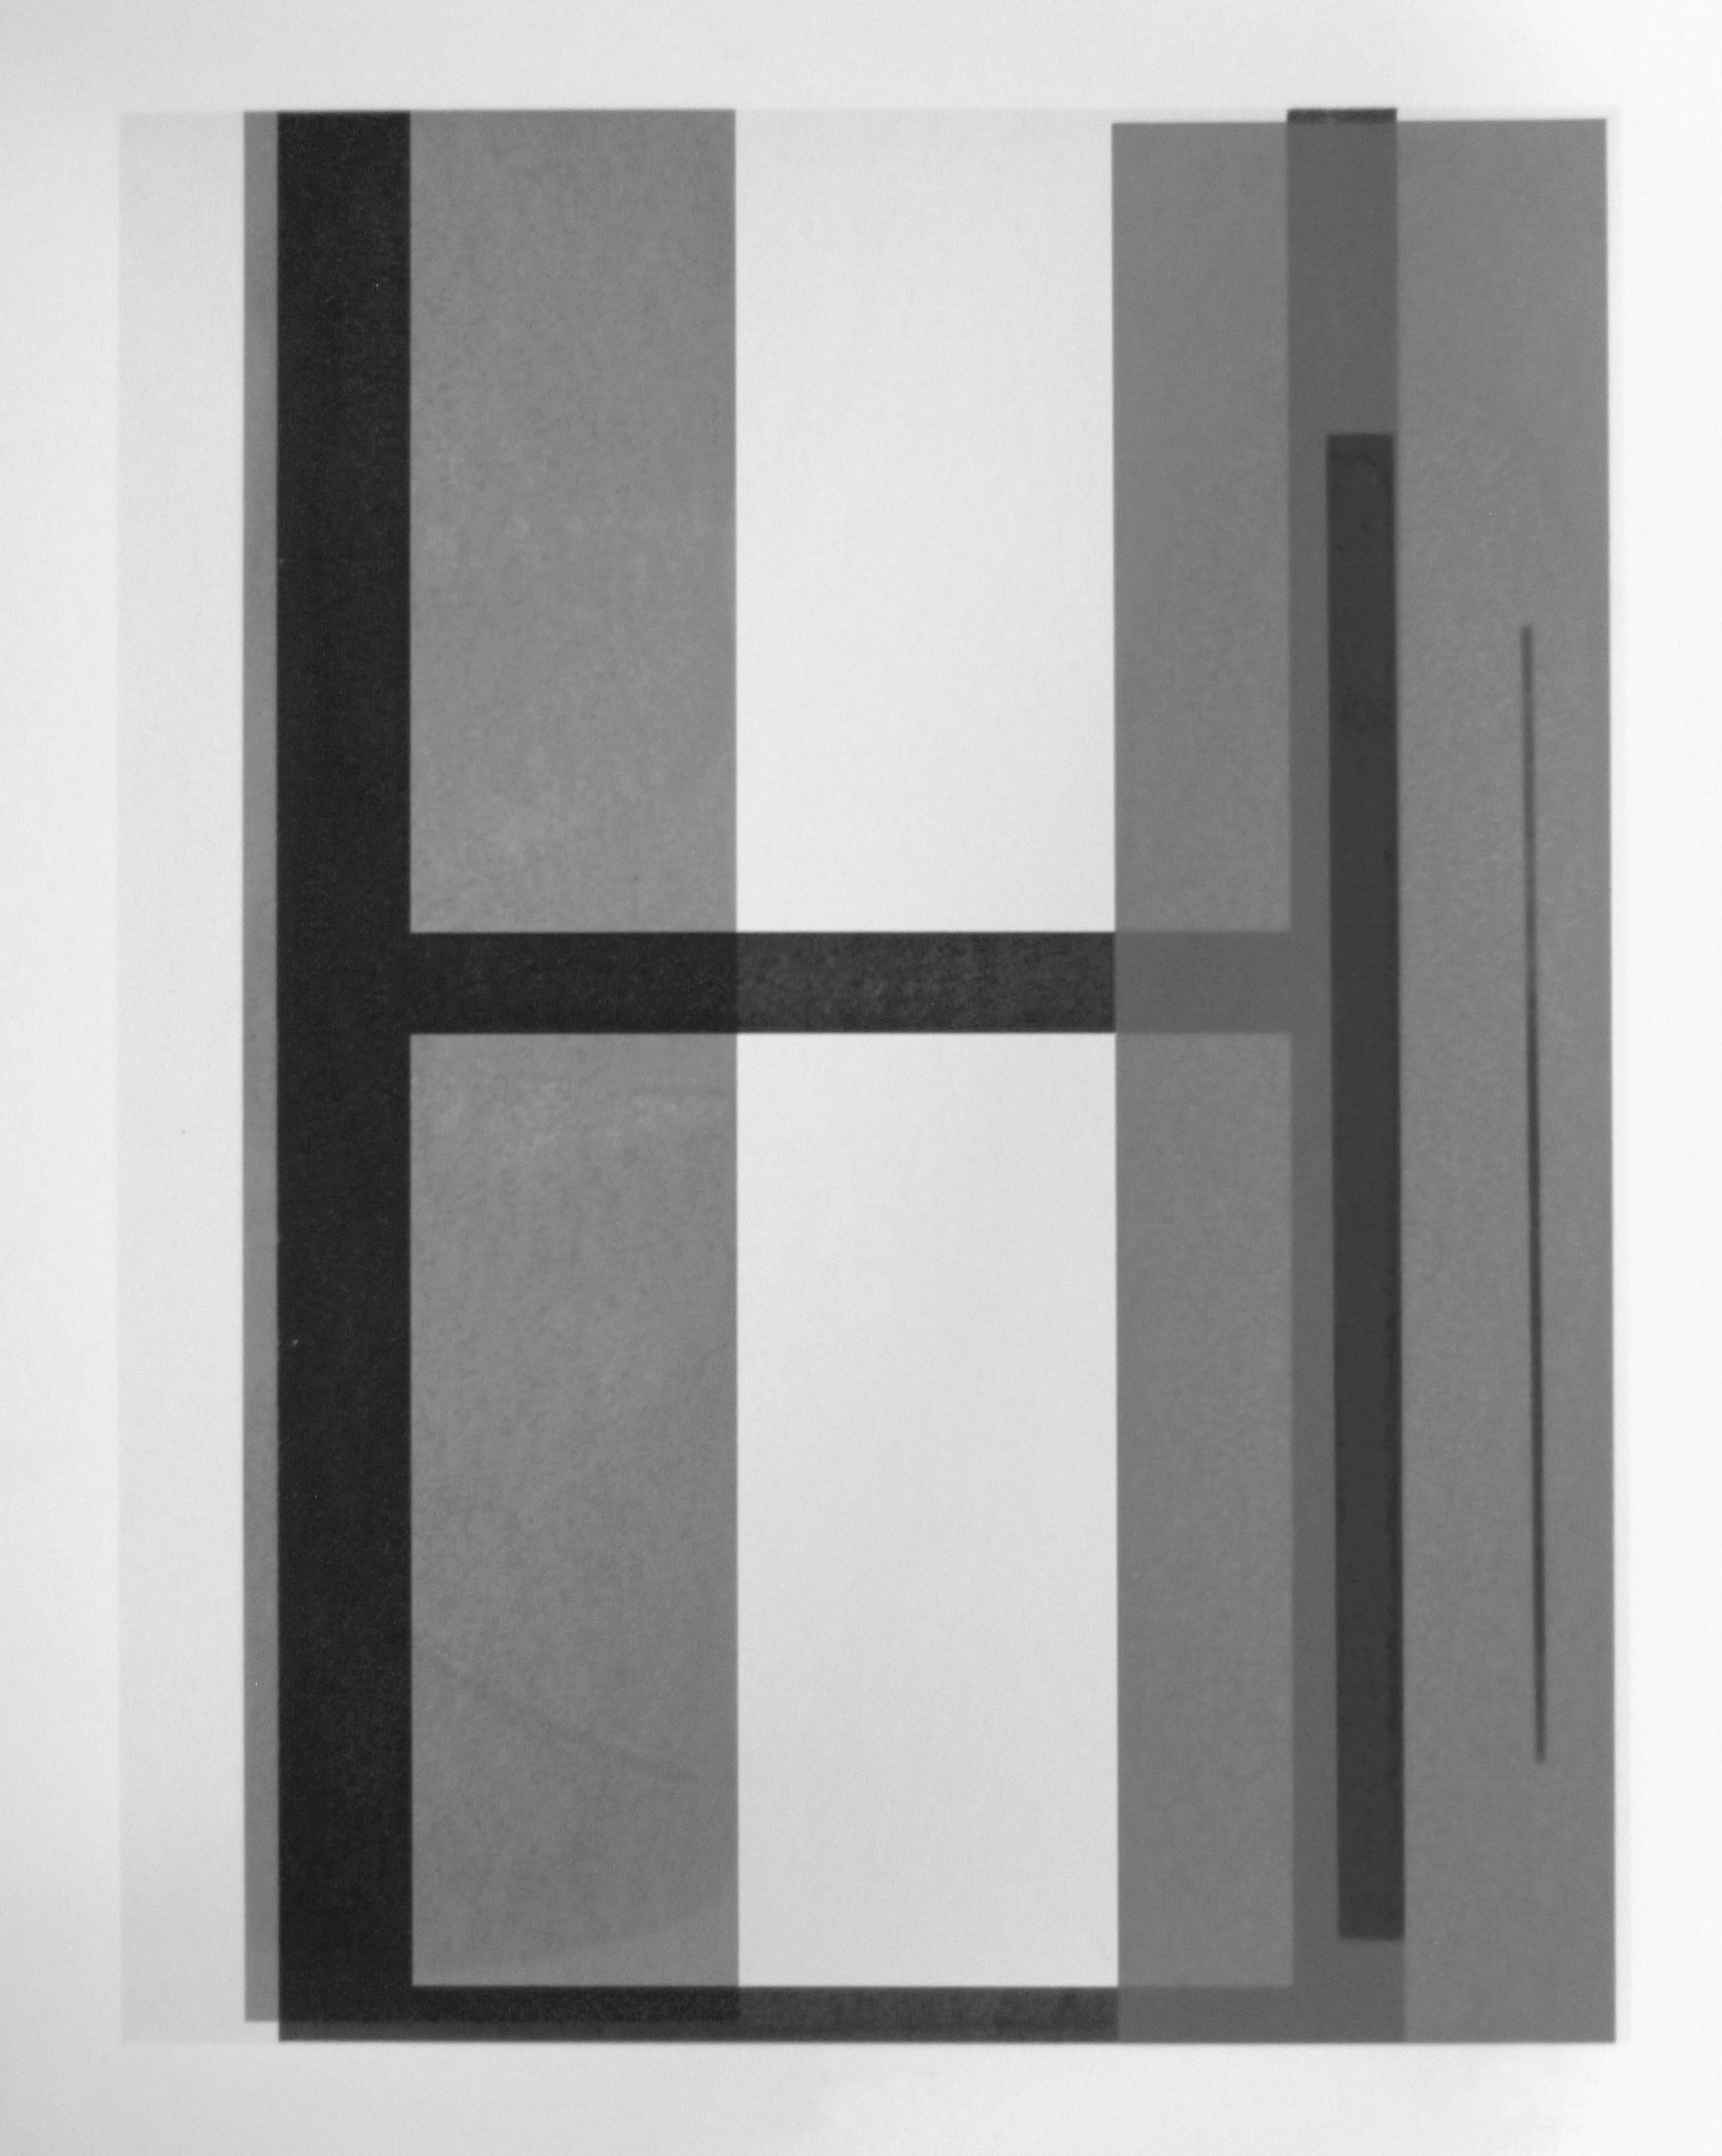 Aperture iv, screen print on paper, 50 x 73 cm, 2018